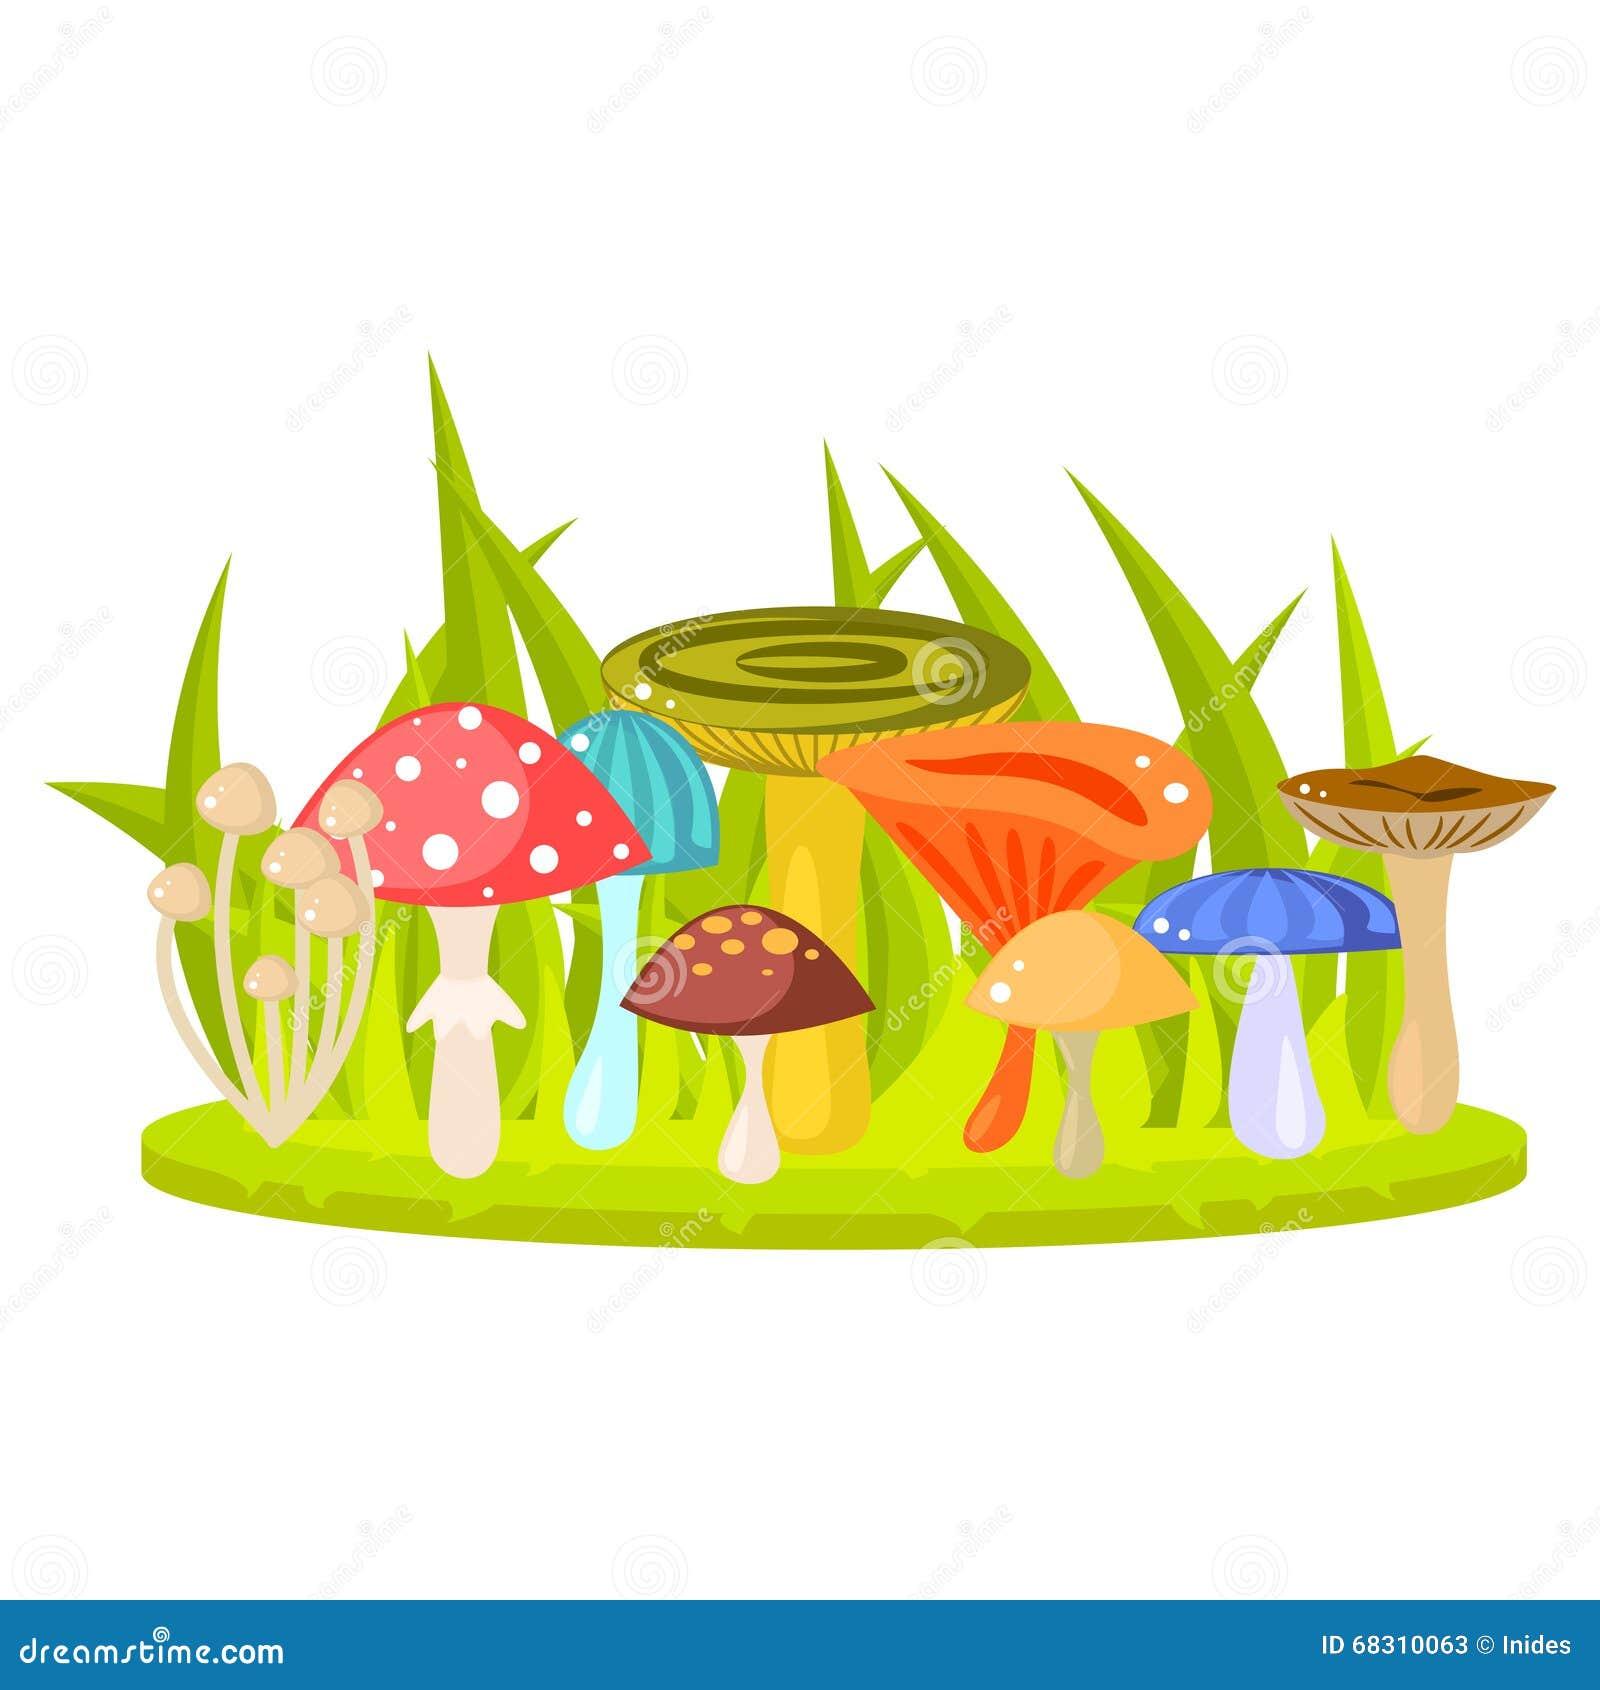 Forest mushrooms on grass lawn vector illustration.